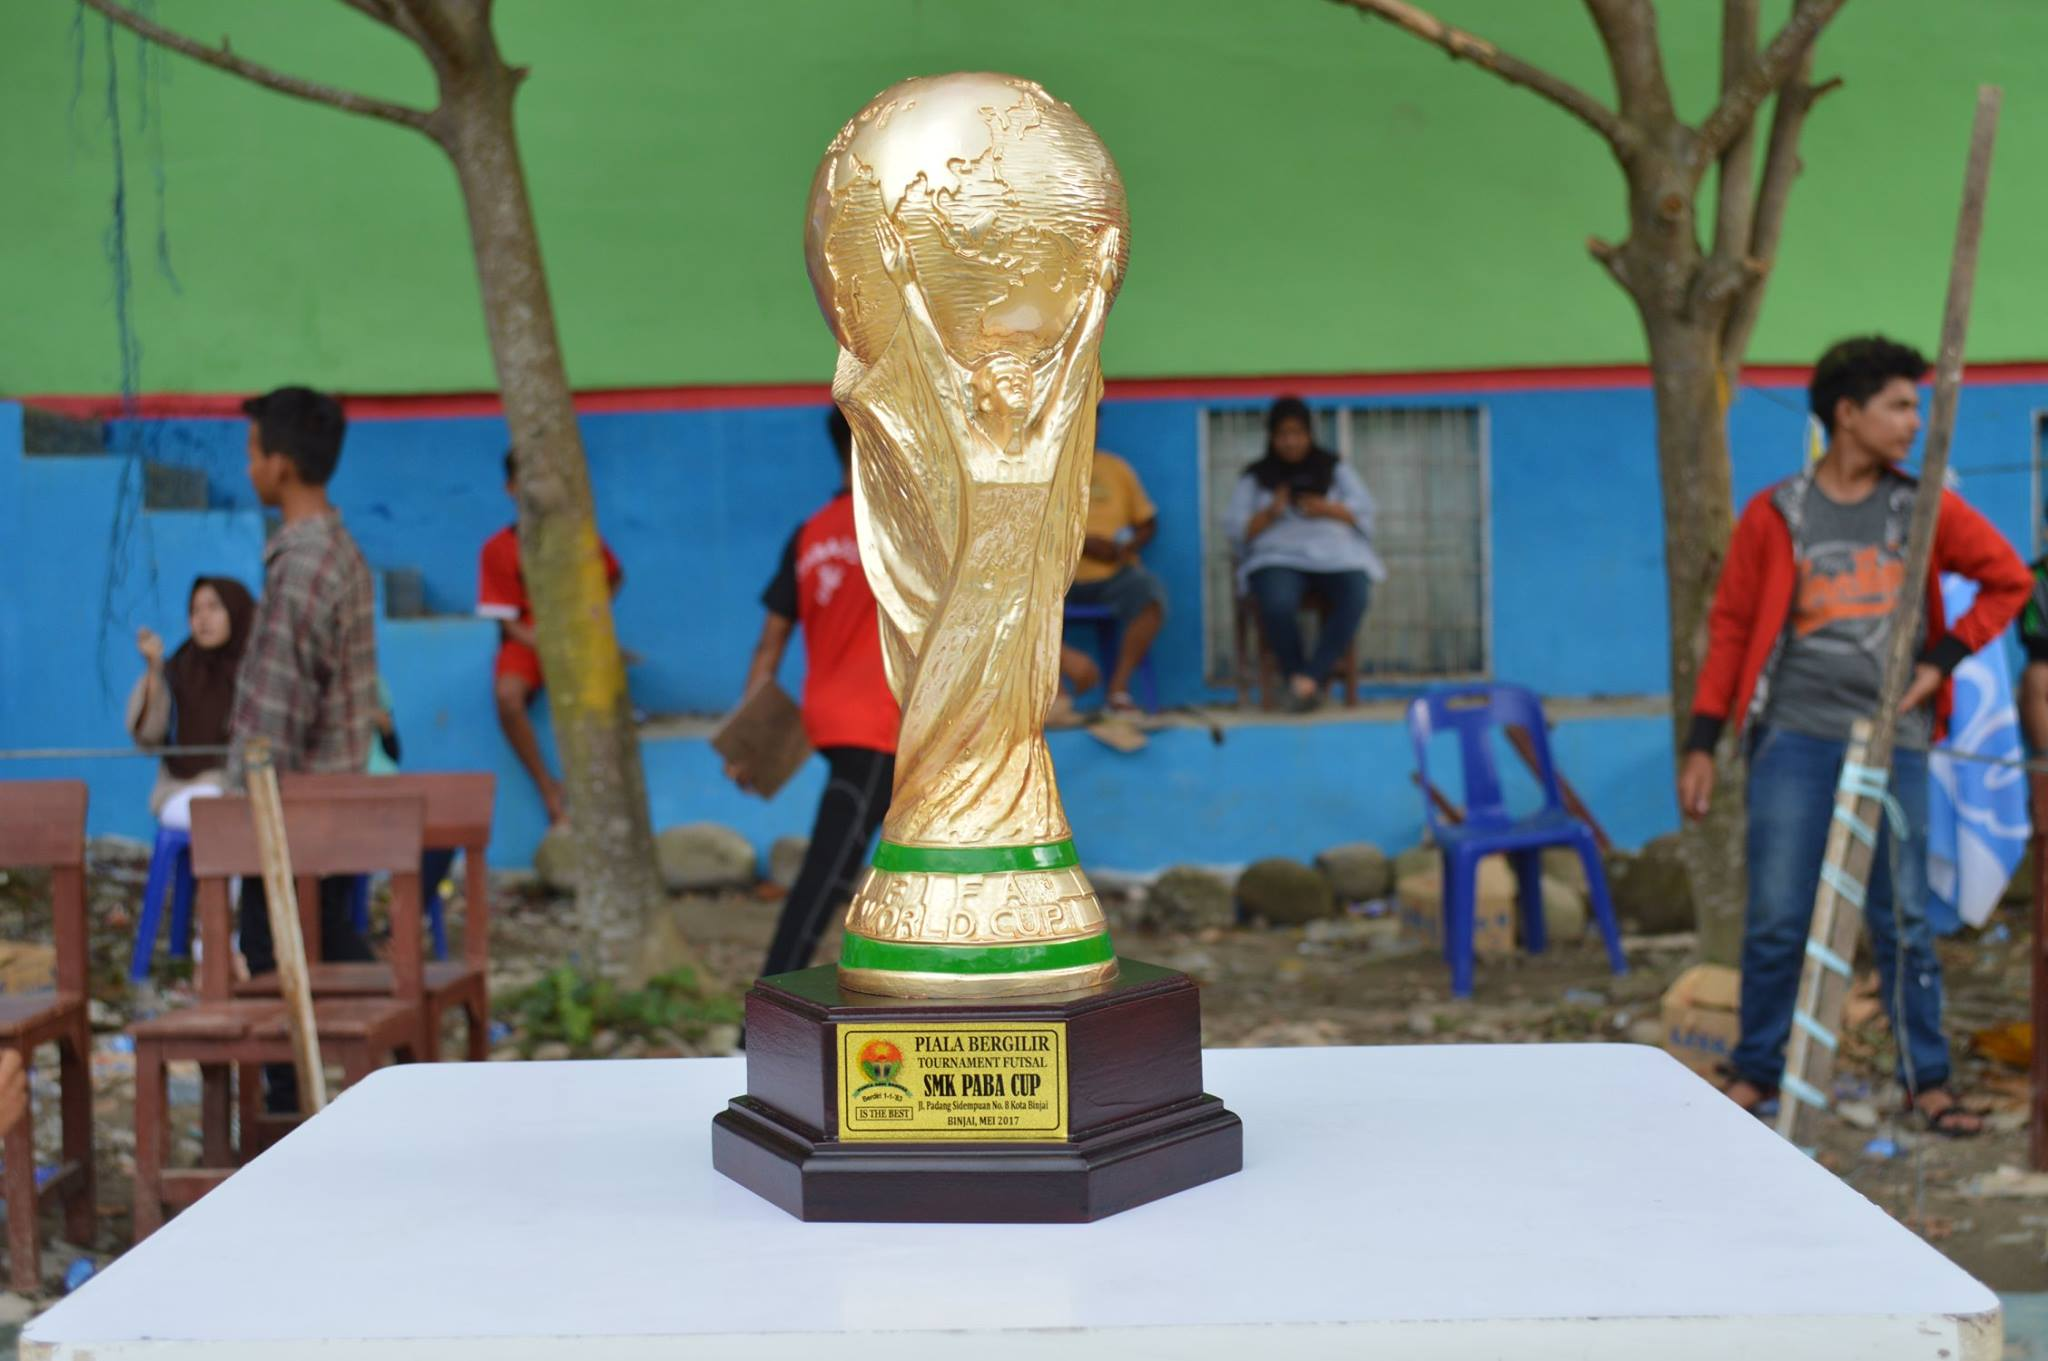 Pemenang Turnament Futsal SMK PABA Cup I